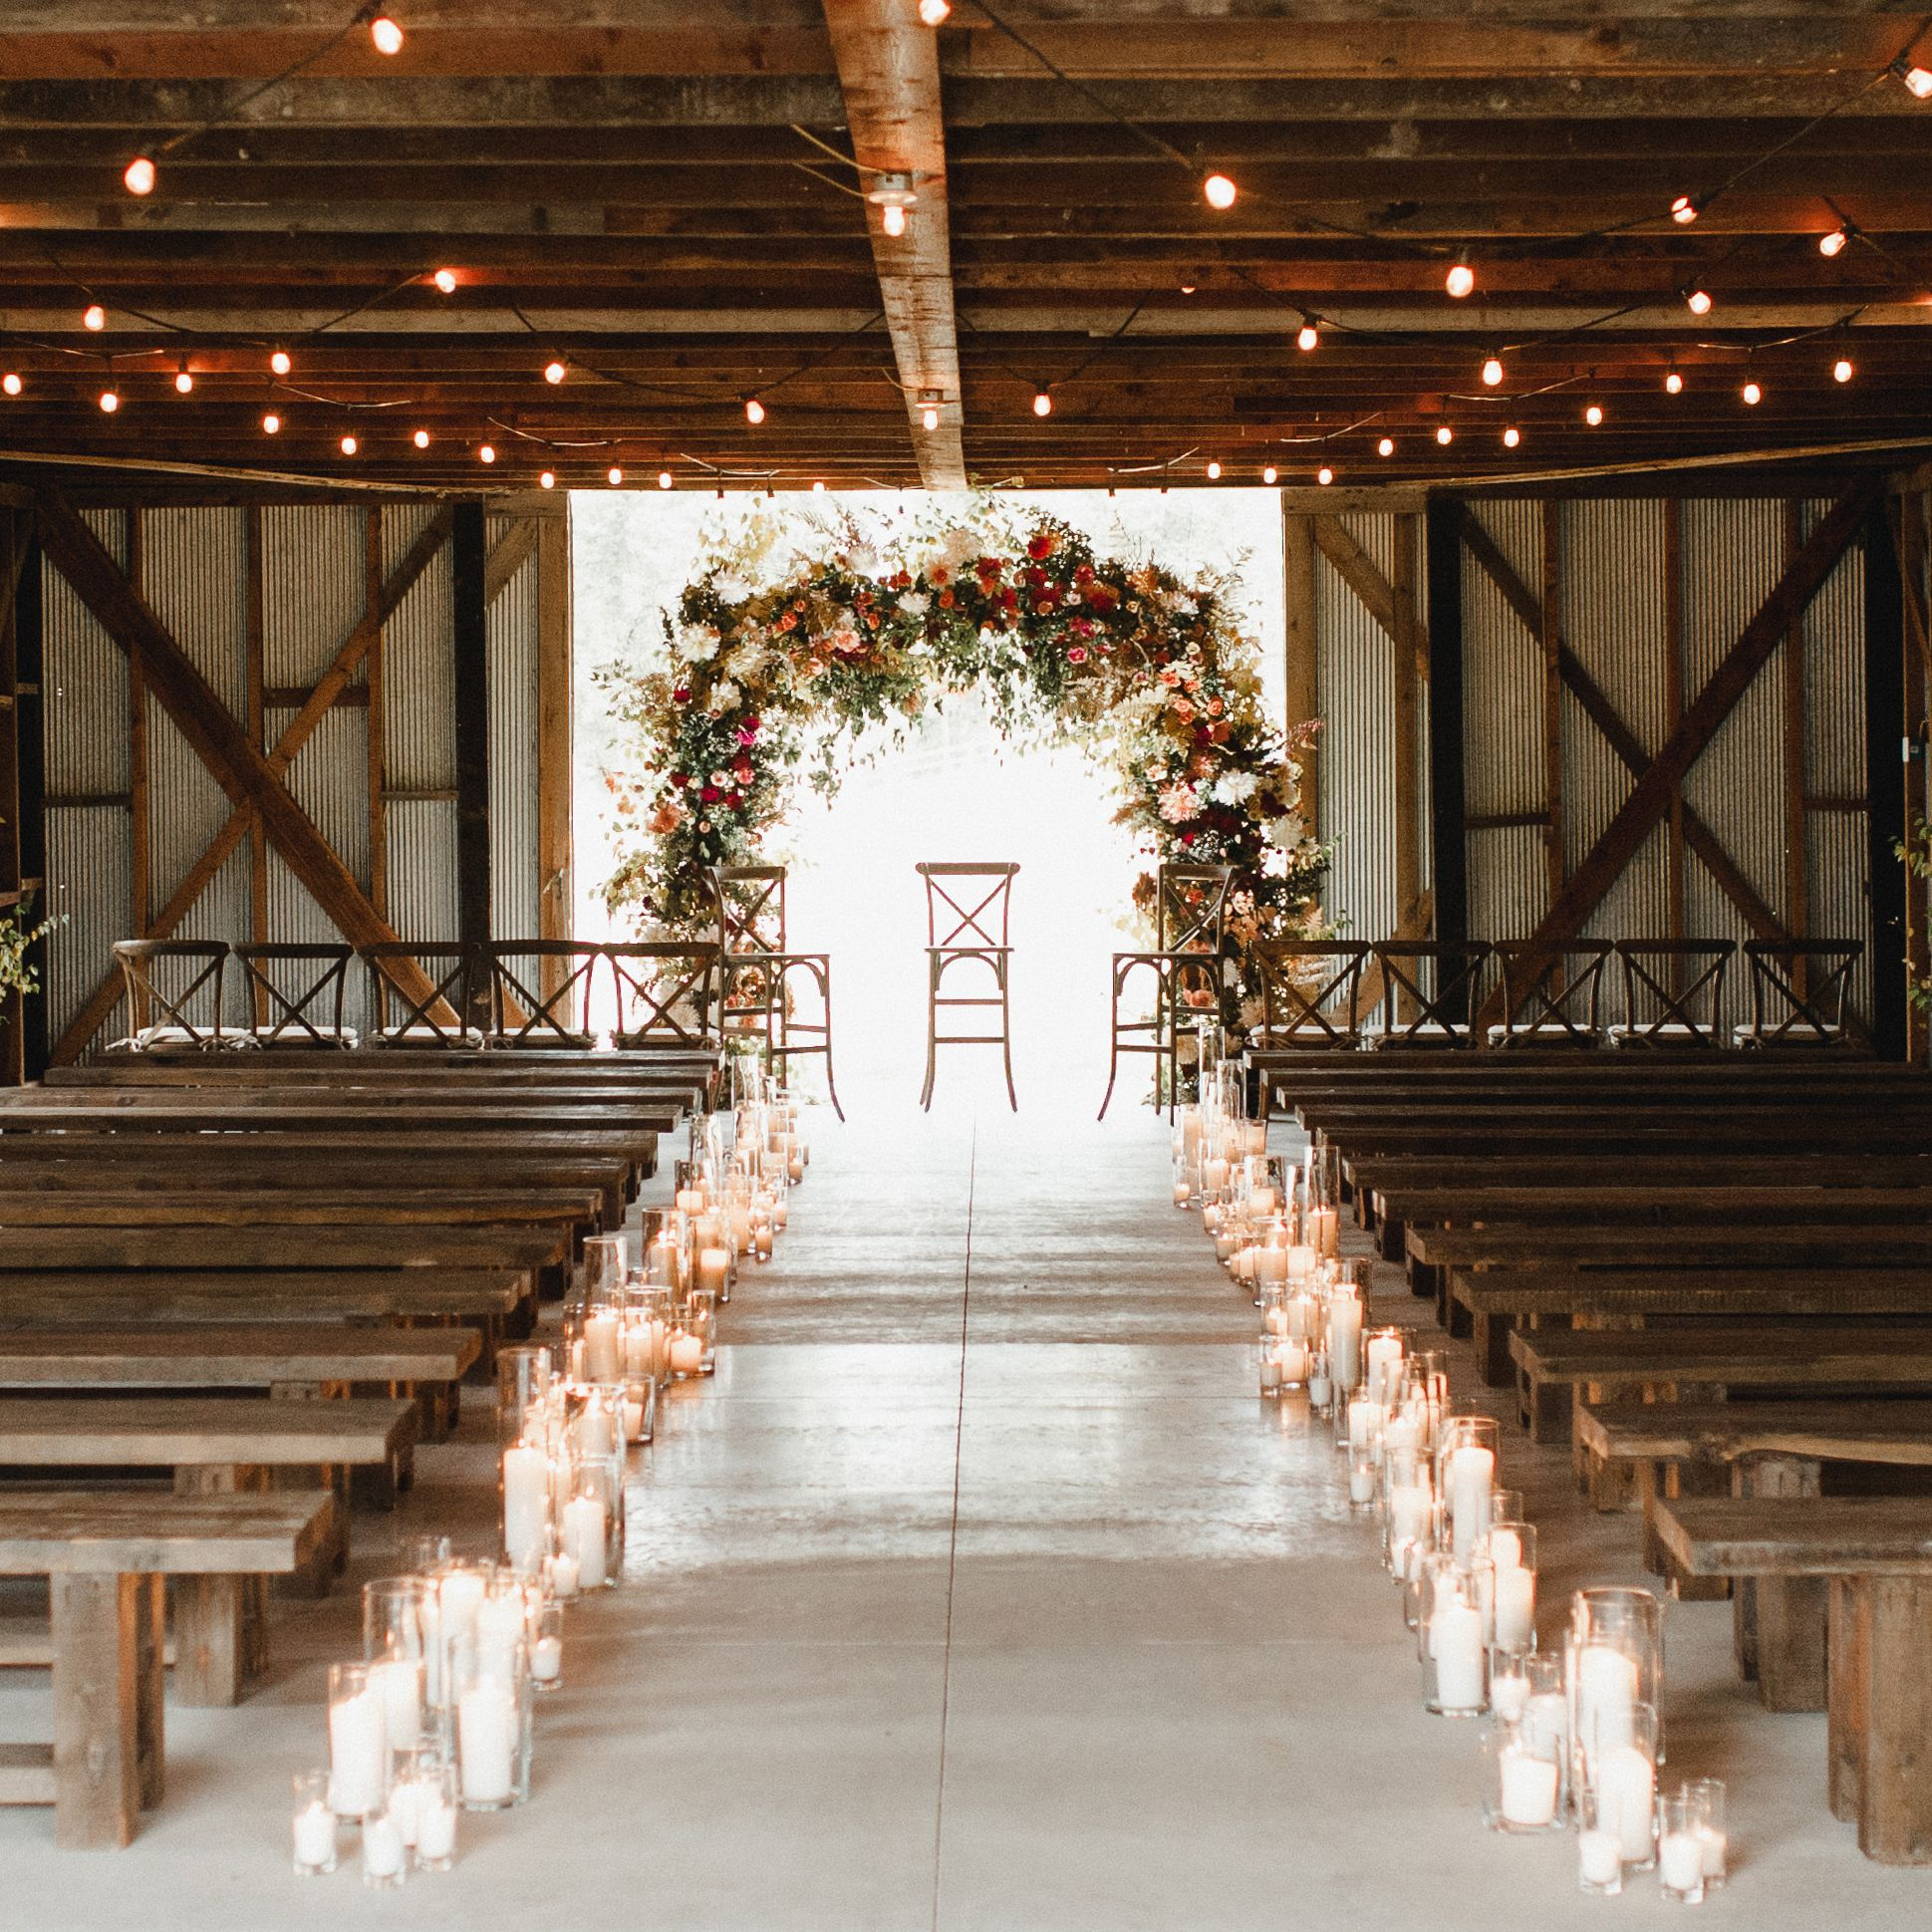 10 Beautiful Ways to Decorate Your Wedding Aisle